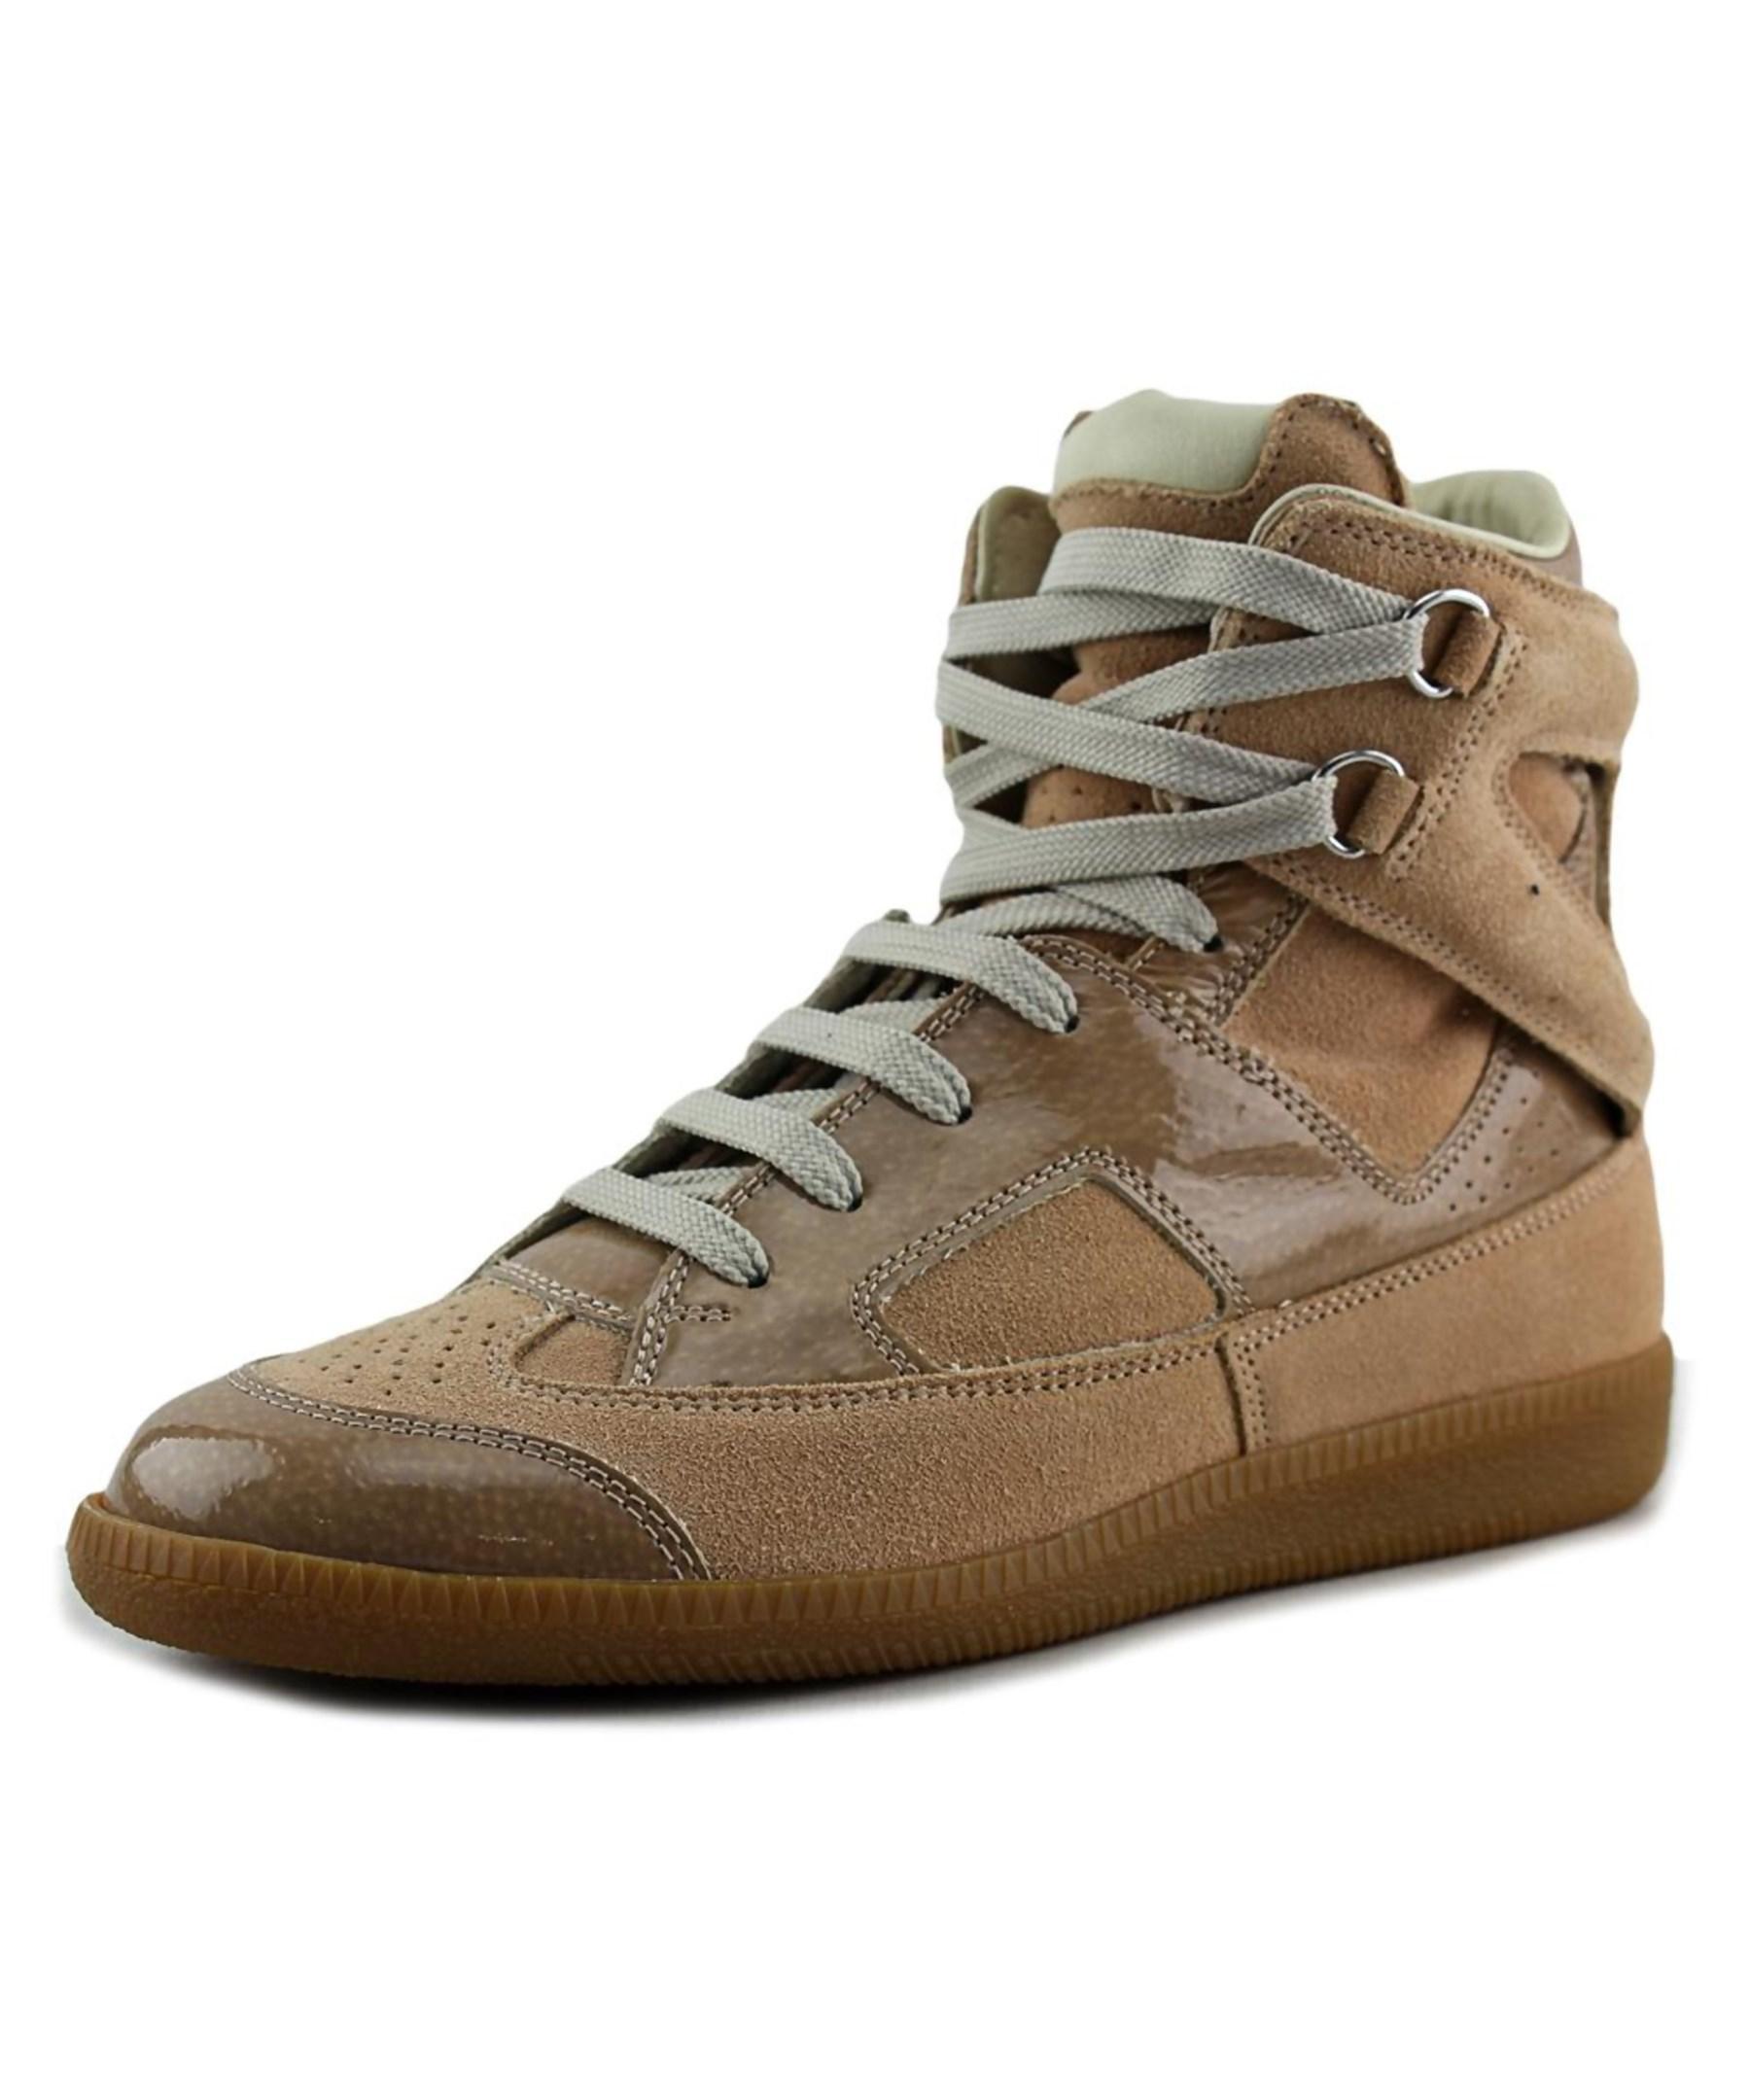 Maison margiela line 22 cutout sneaker women leather tan for Maison margiela 22